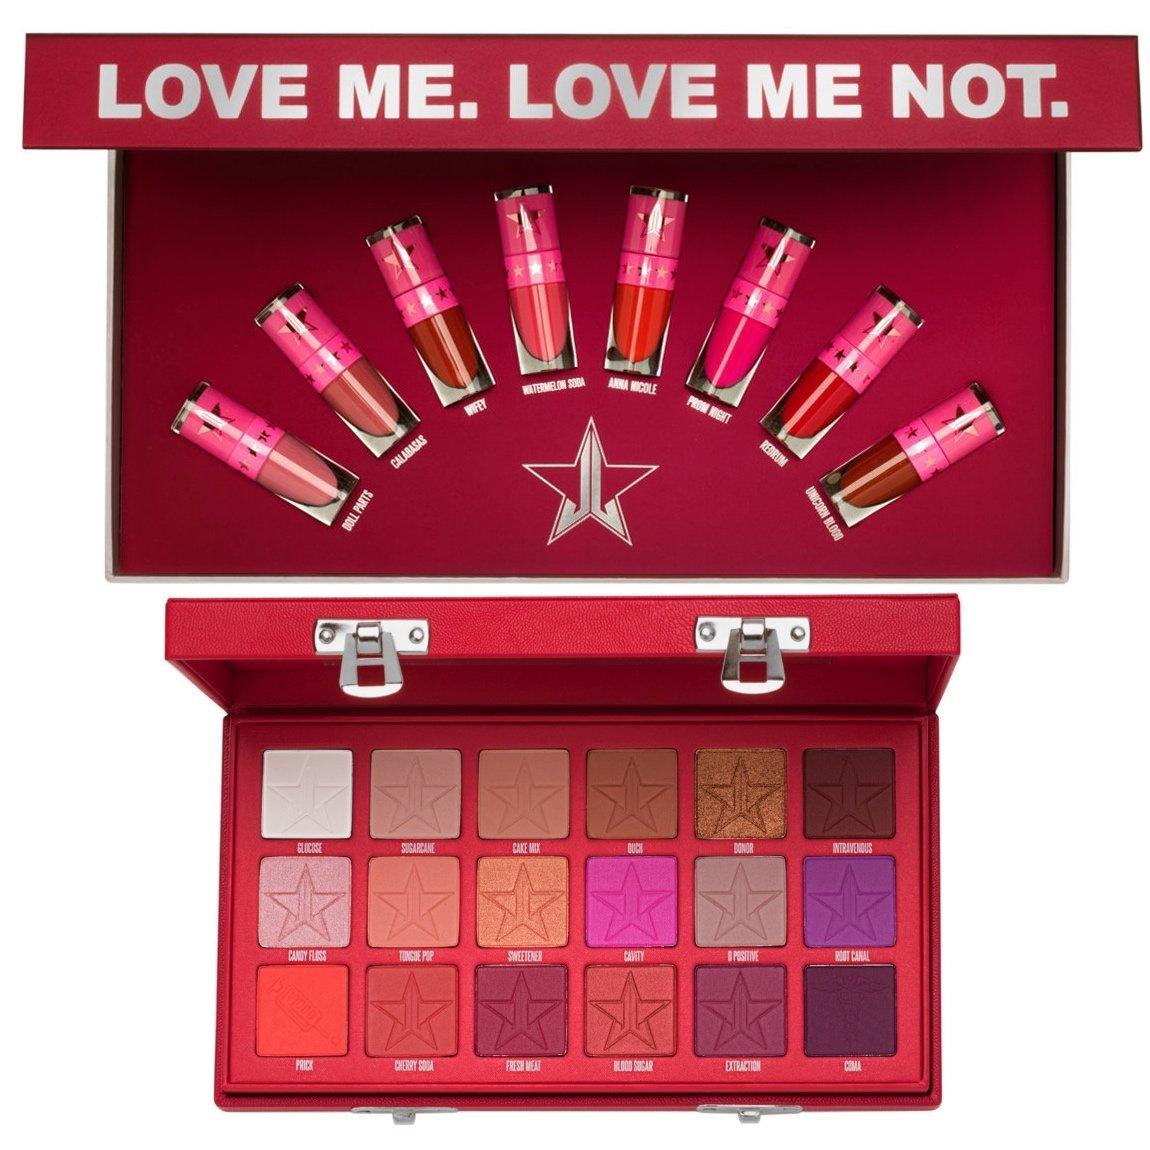 Jeffree Star Cosmetics Mini Reds & Pinks & Blood Sugar Eyeshadow Palette Bundle product swatch.